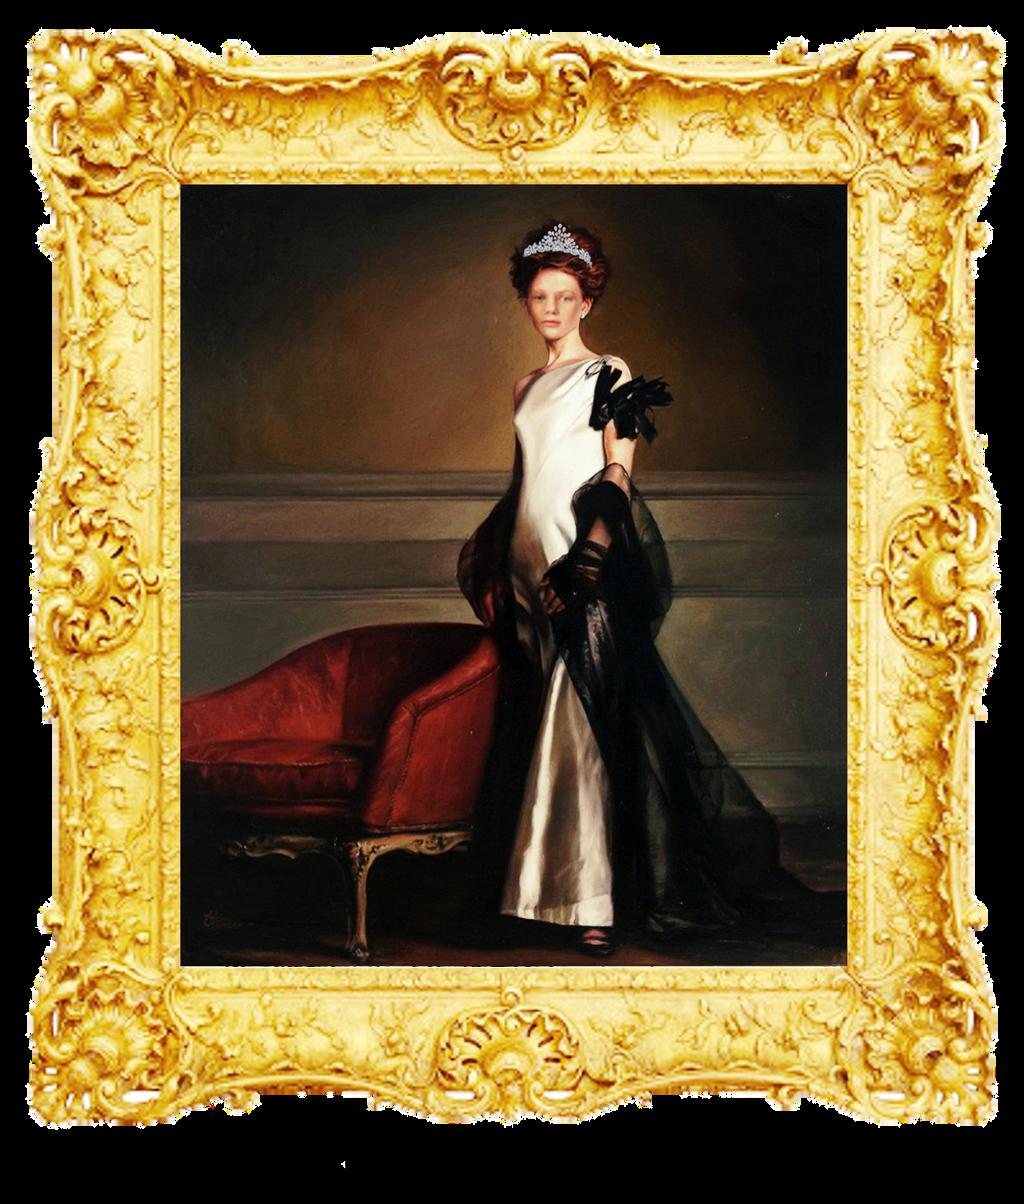 The Portrait of a Future Queen